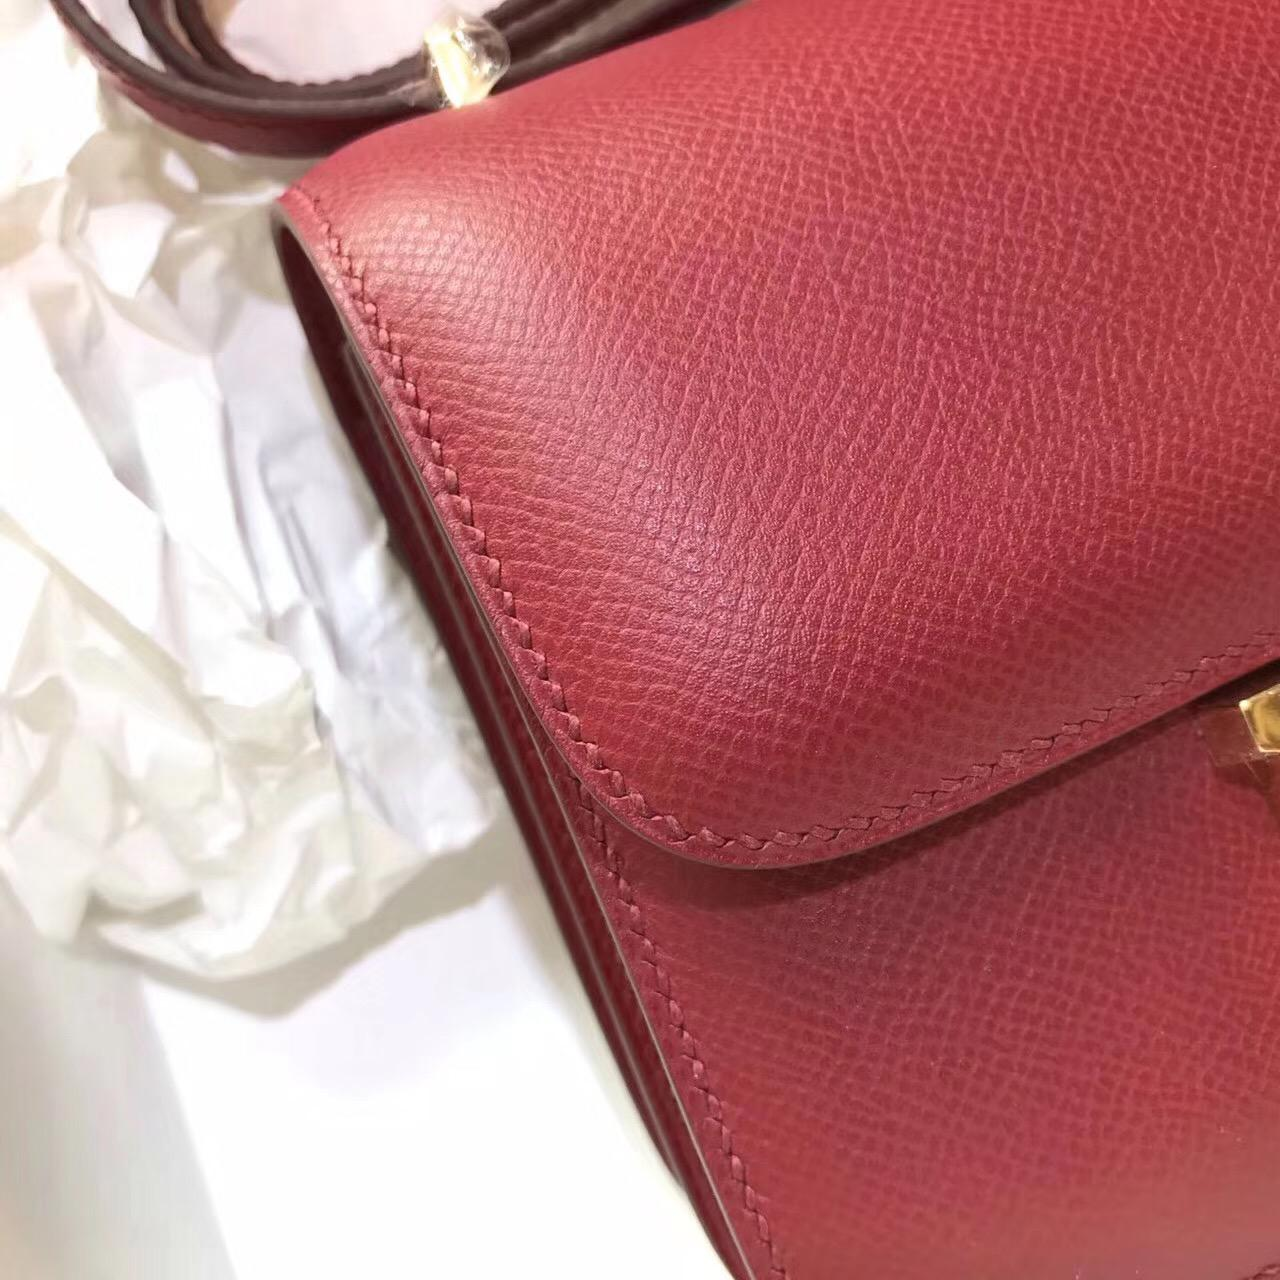 最難買的包袋是什麼 Constance 18 epsom k1 石榴紅 rouge grenat 金扣